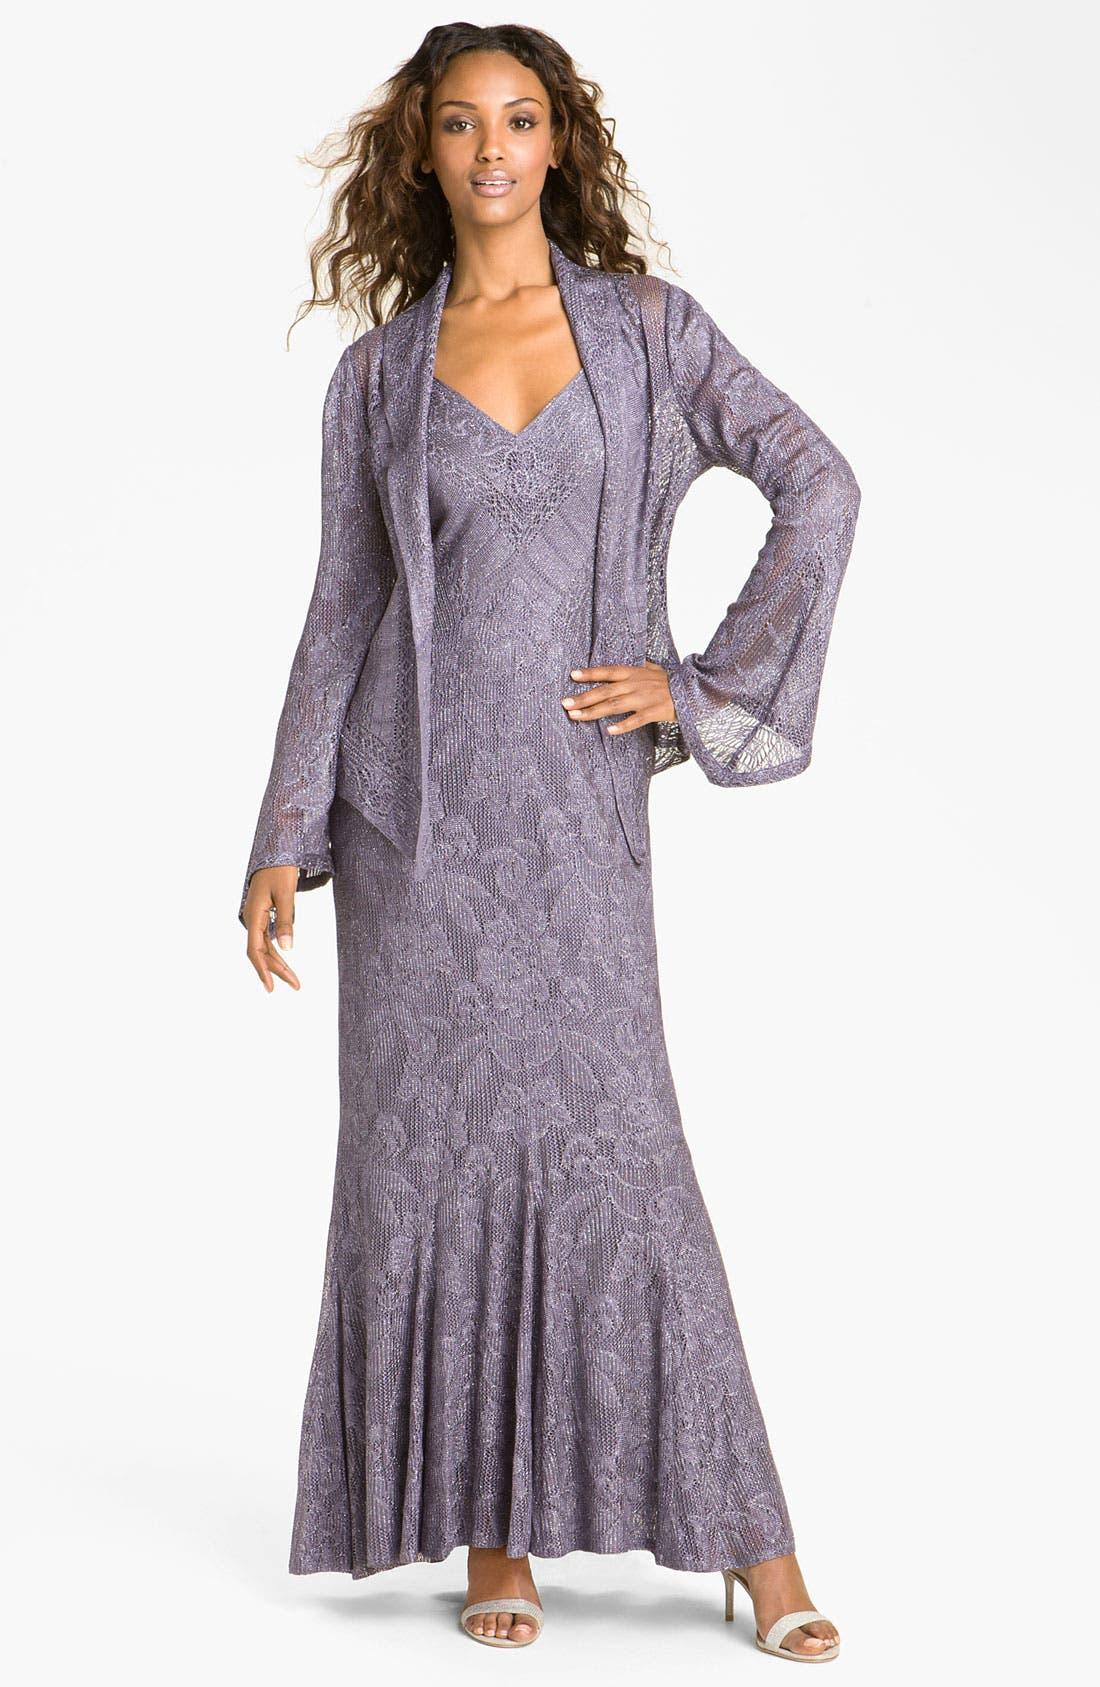 Alternate Image 1 Selected - Damianou Metallic Knit Gown & Jacket